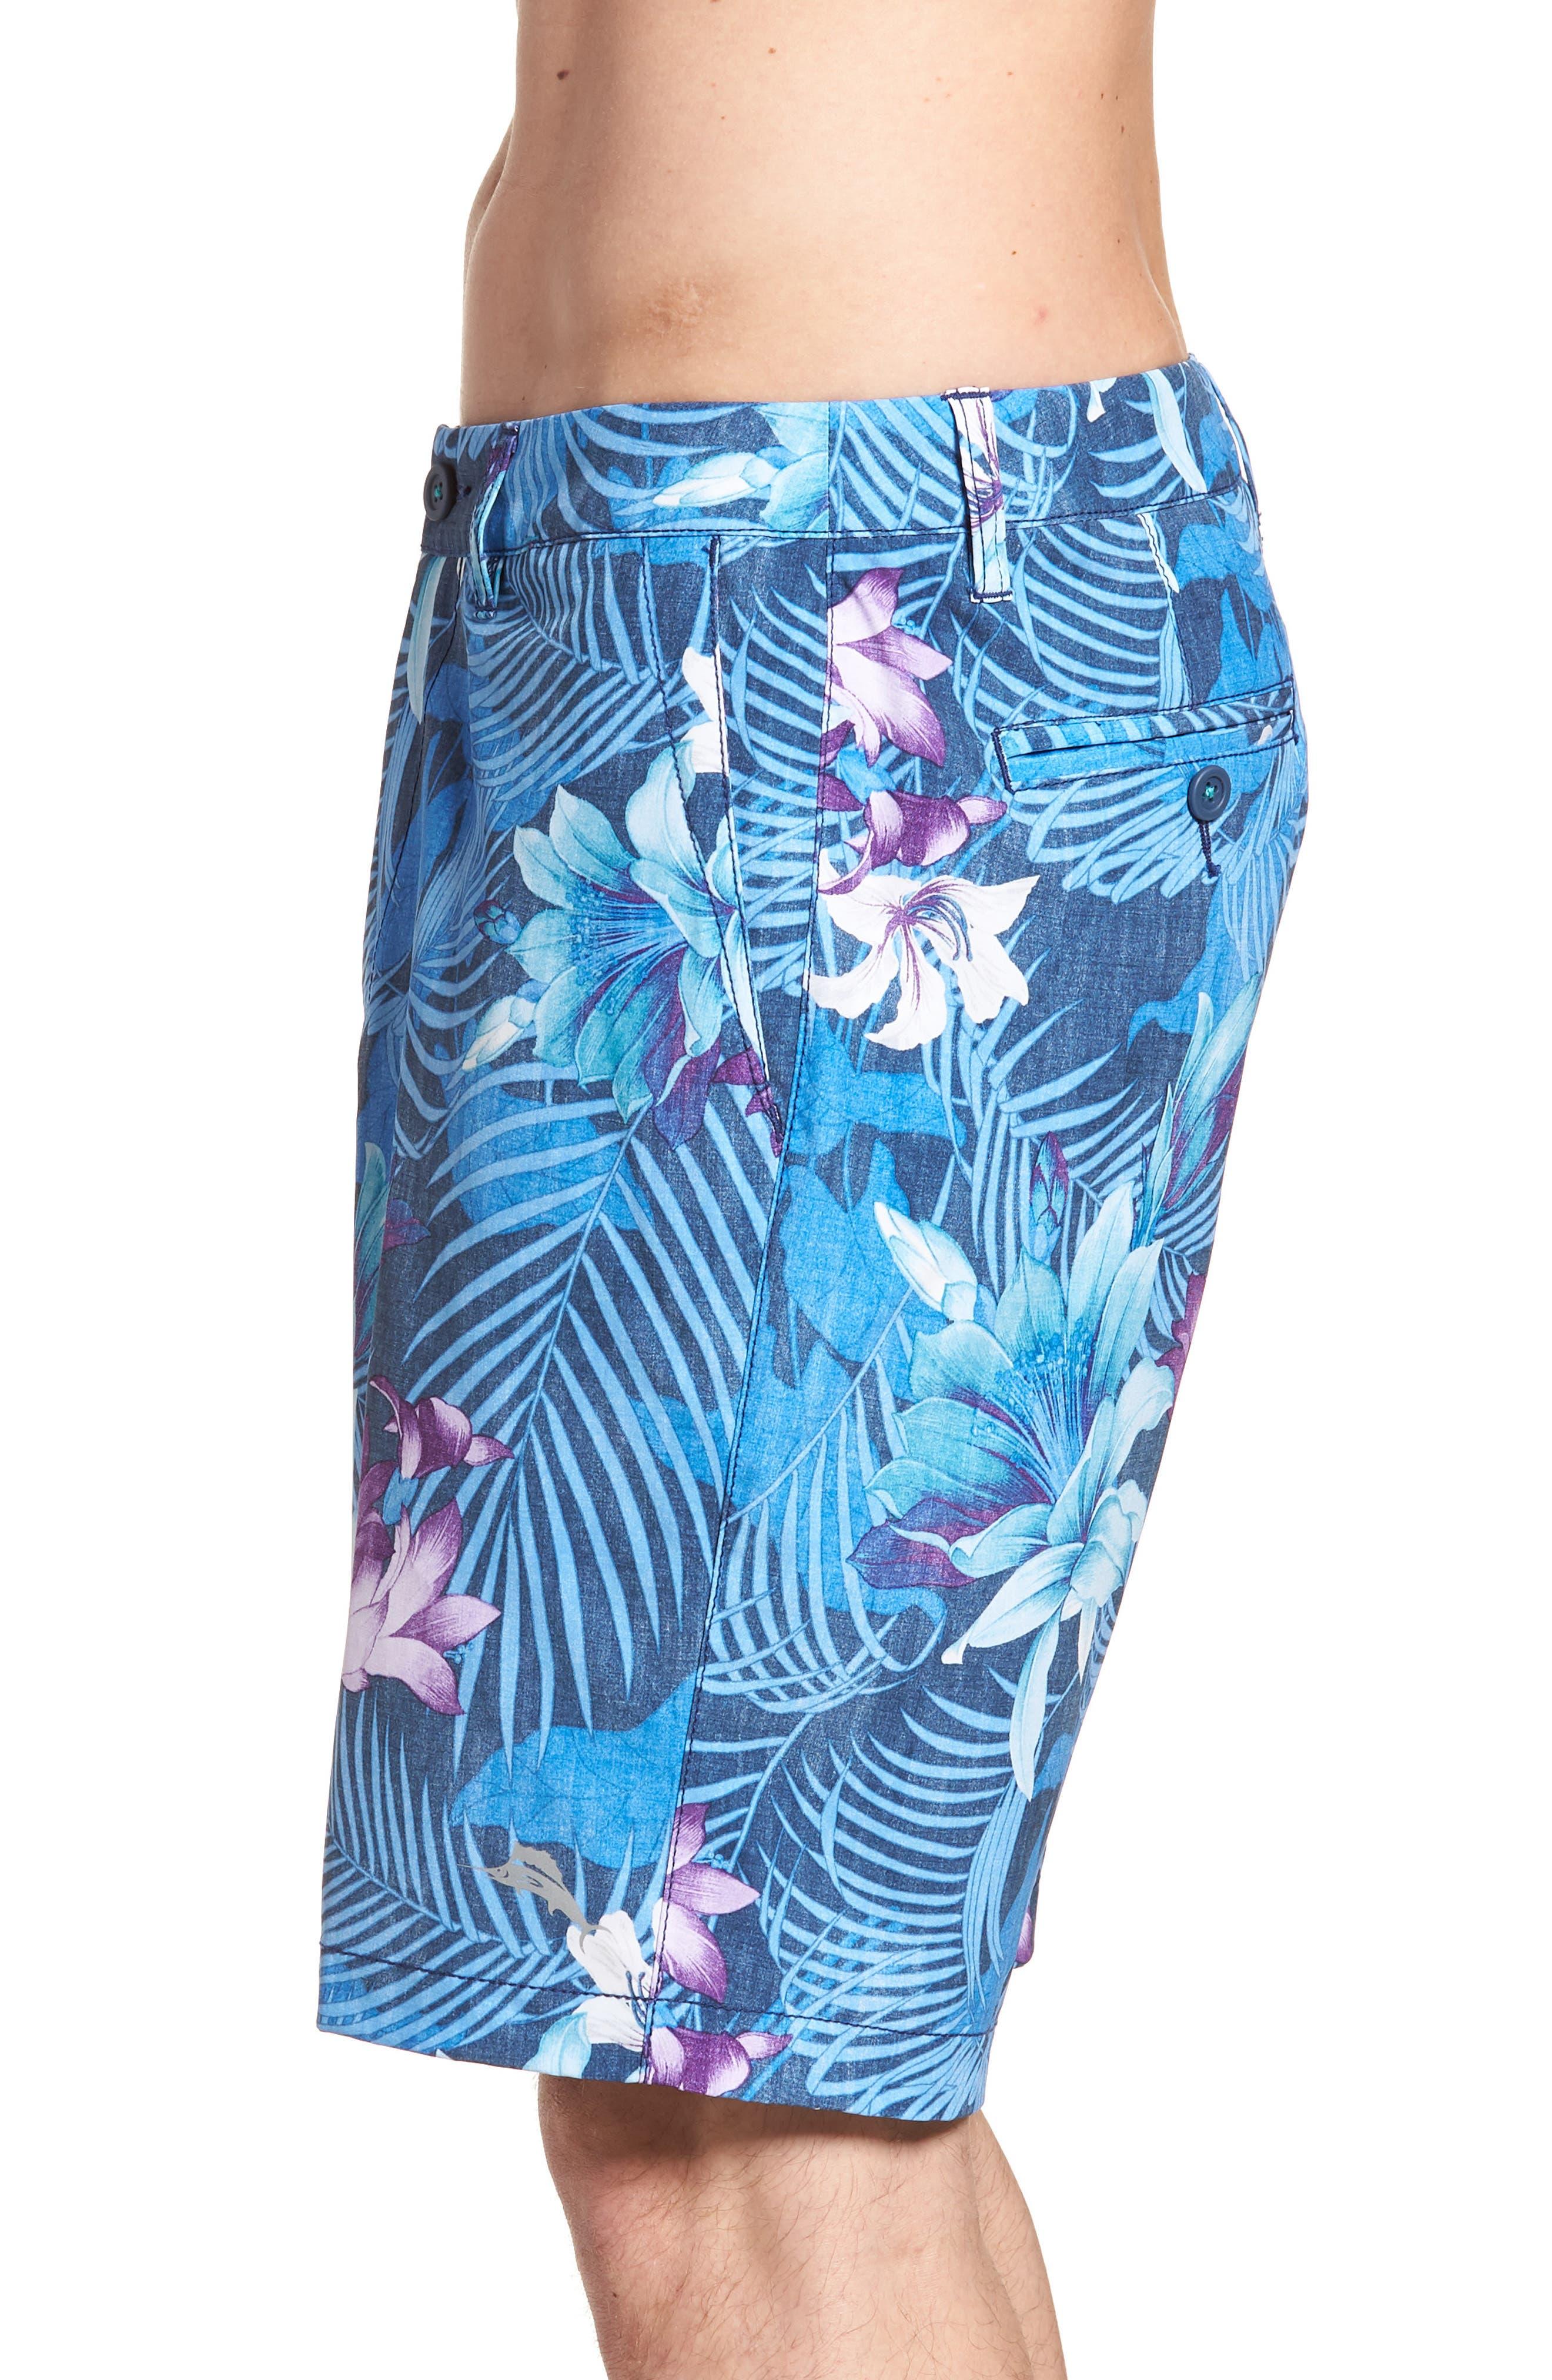 Cayman Laredo Blooms Board Shorts,                             Alternate thumbnail 3, color,                             Ocean Deep